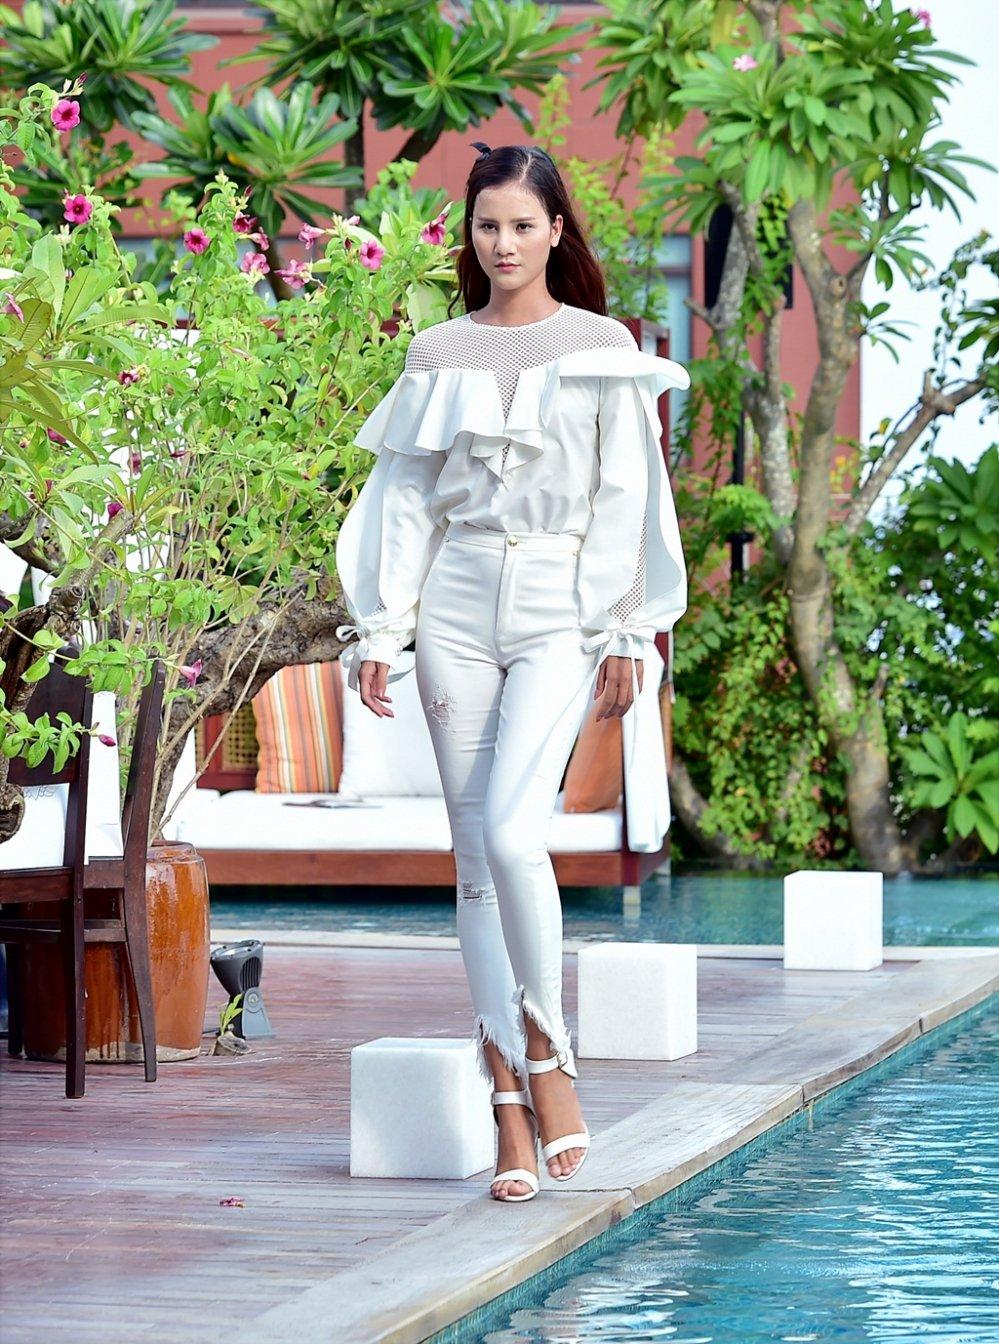 Ba Quan quan Top Model Mau Thuy - Huong Ly - Ngoc Chau tranh nhau lam first face, vedette hinh anh 12